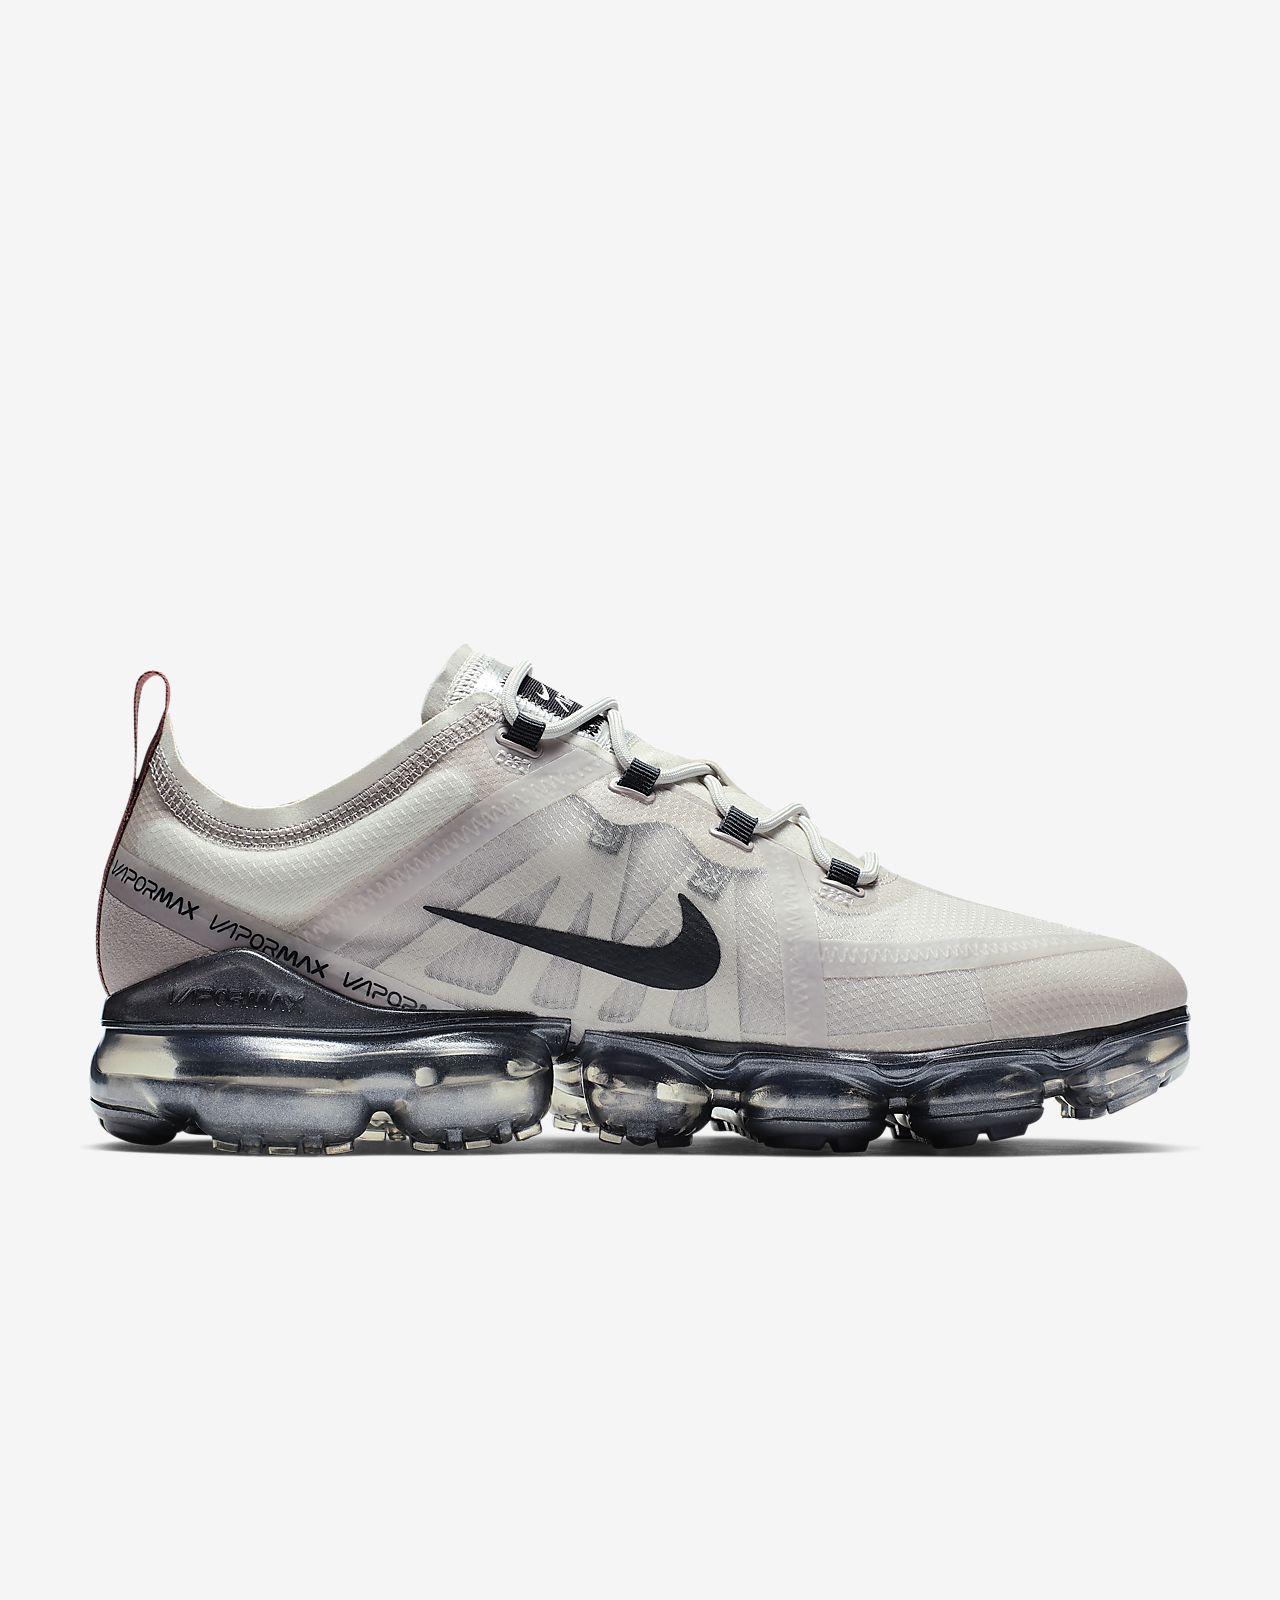 9468ca3b4ac Low Resolution Nike Air VaporMax 2019 Shoe Nike Air VaporMax 2019 Shoe